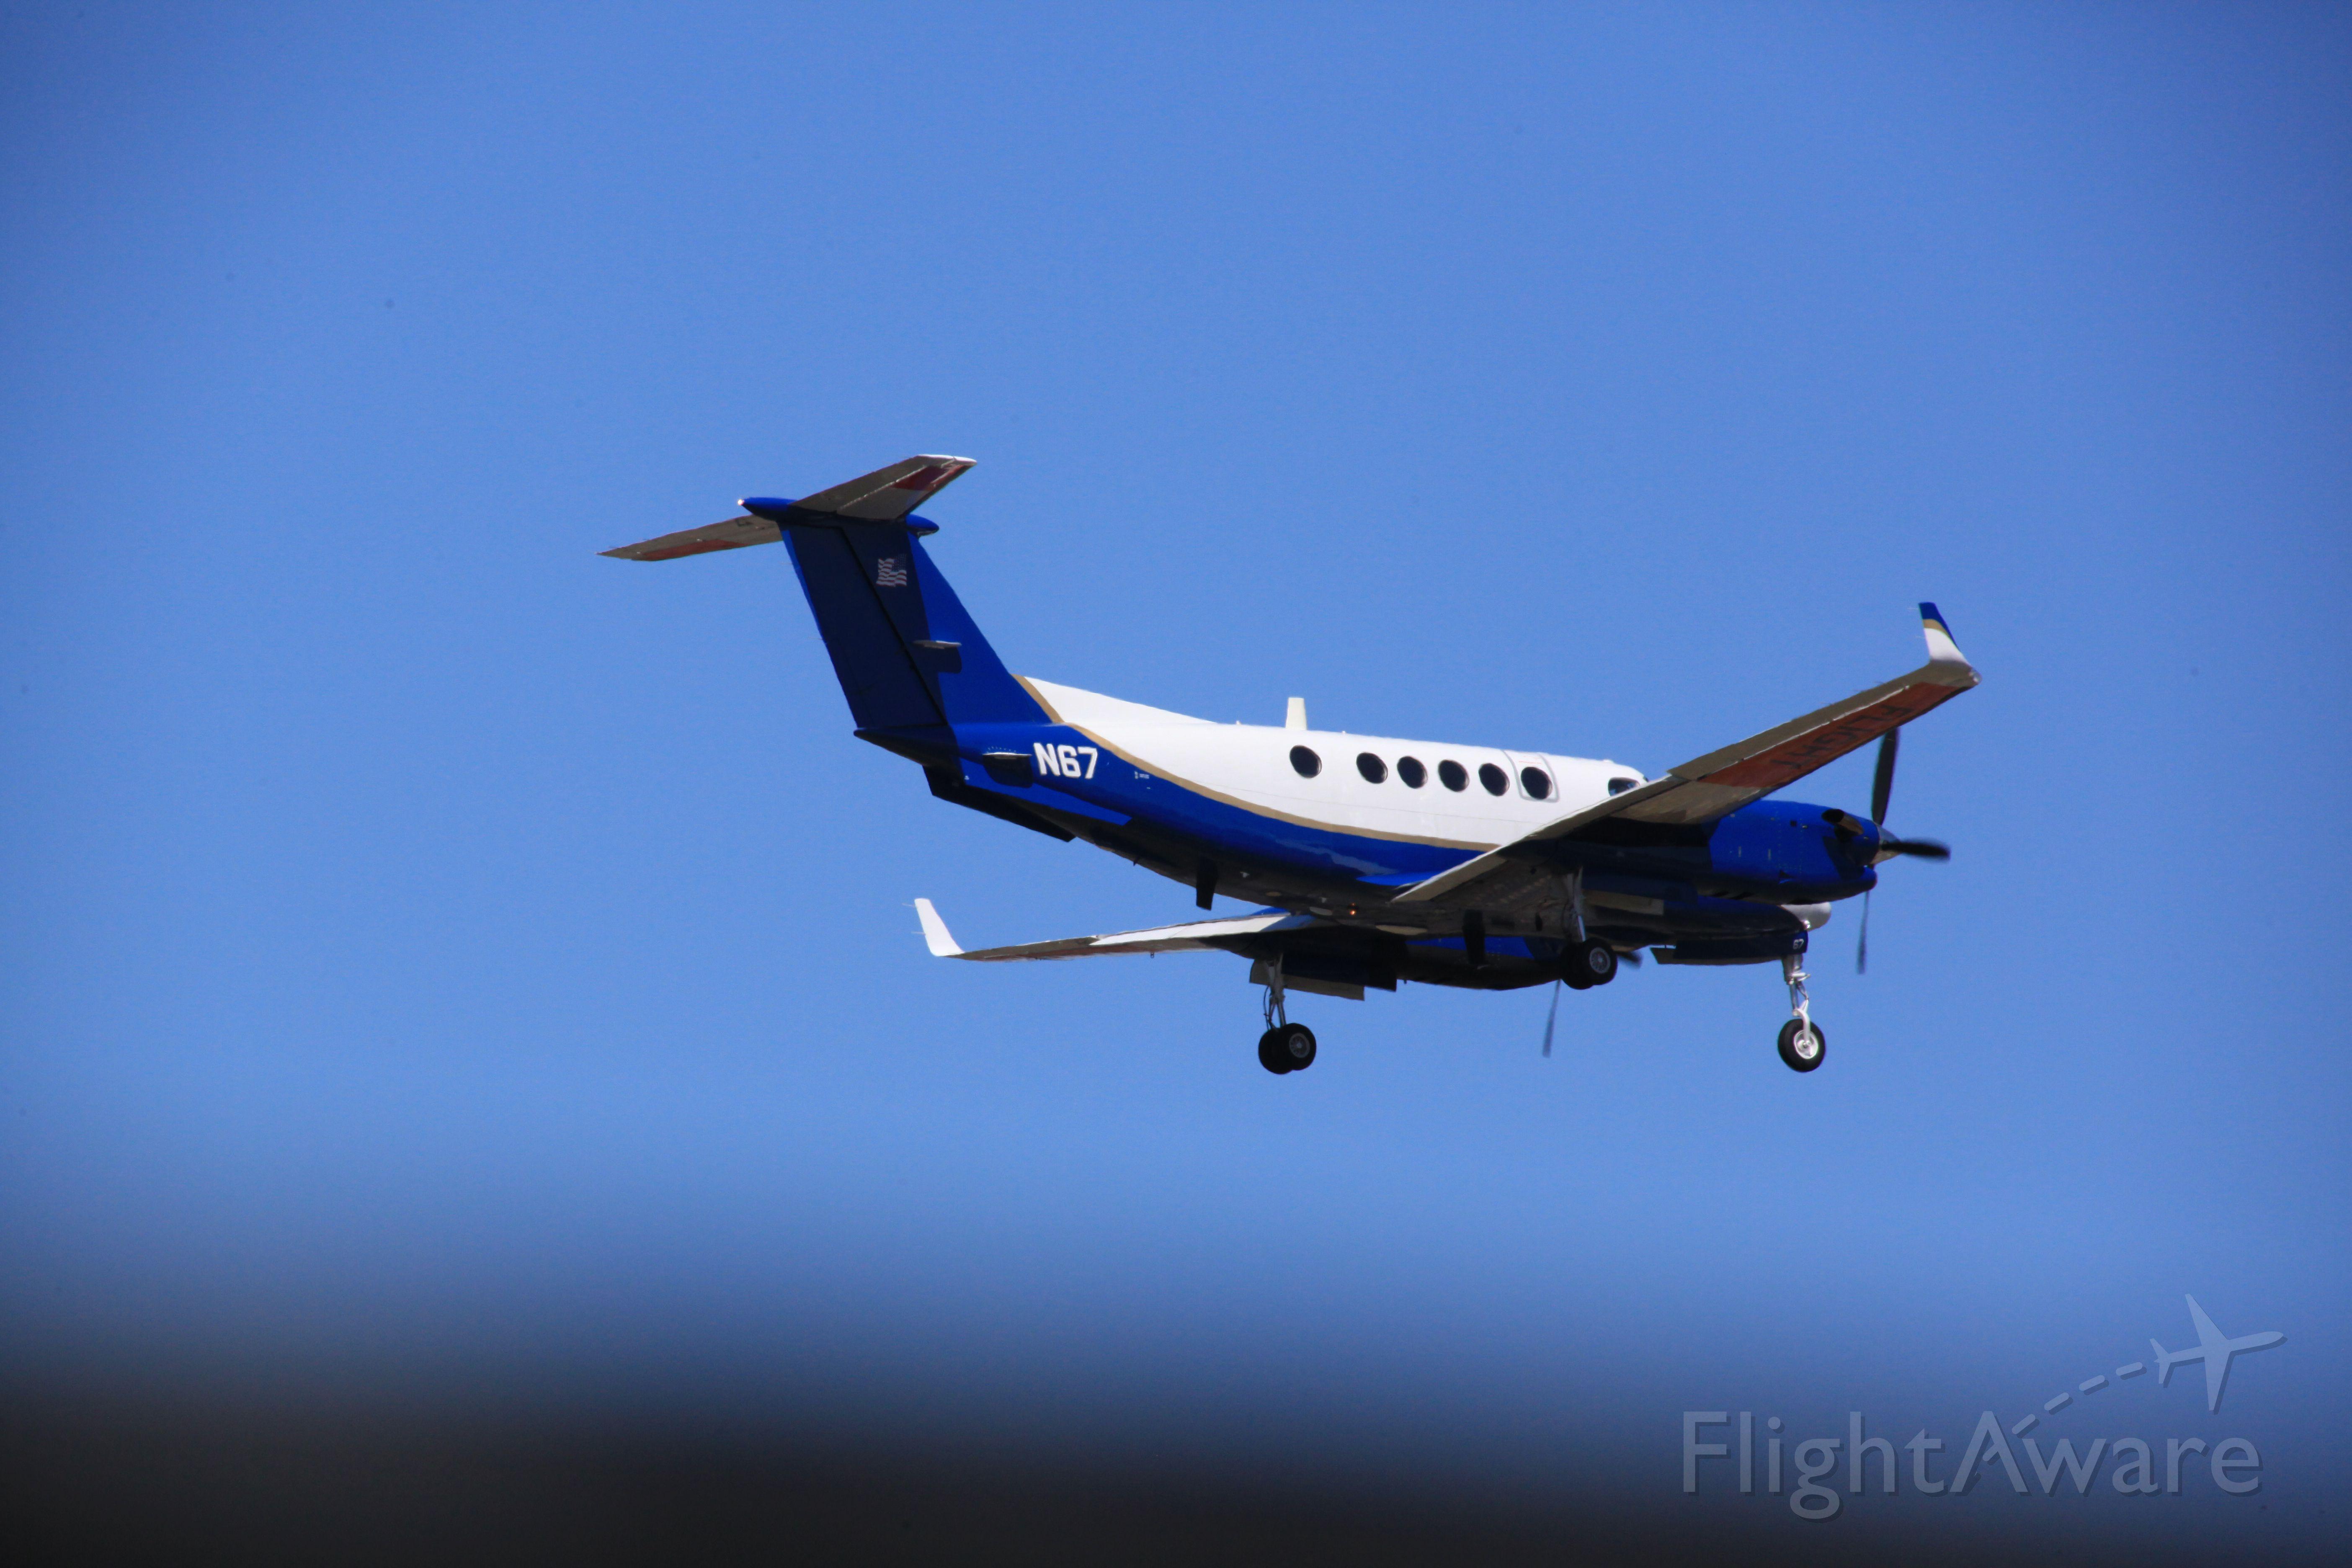 Beechcraft Super King Air 300 (N67)